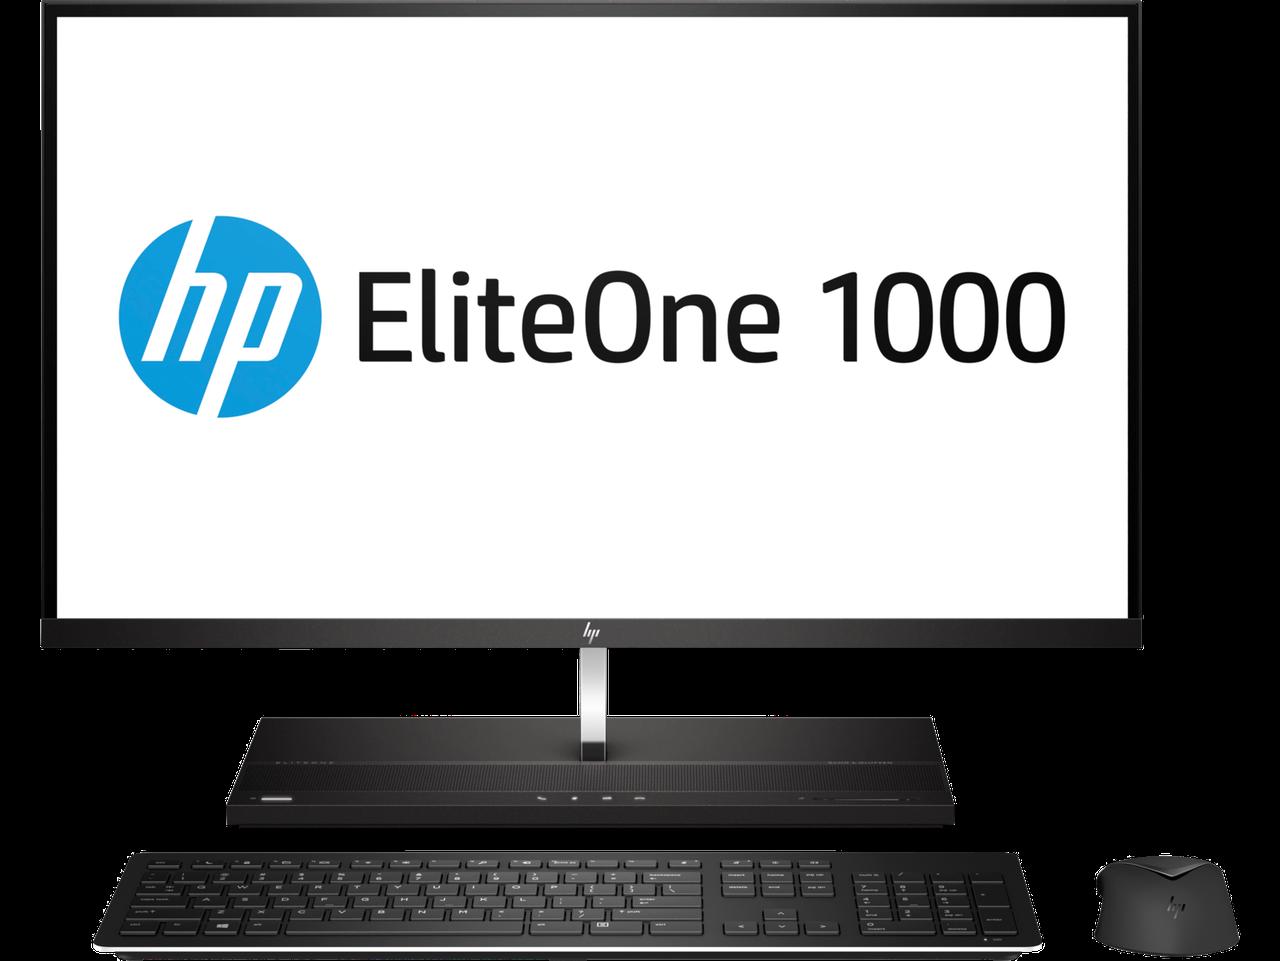 МоноблокHP 4PD88EA EliteOne 1000 G2 AiO NT i7-8700 512G 16.0G Win10 Pro 27 4K NT / i7-8700 / 16GB / 512GB SSD